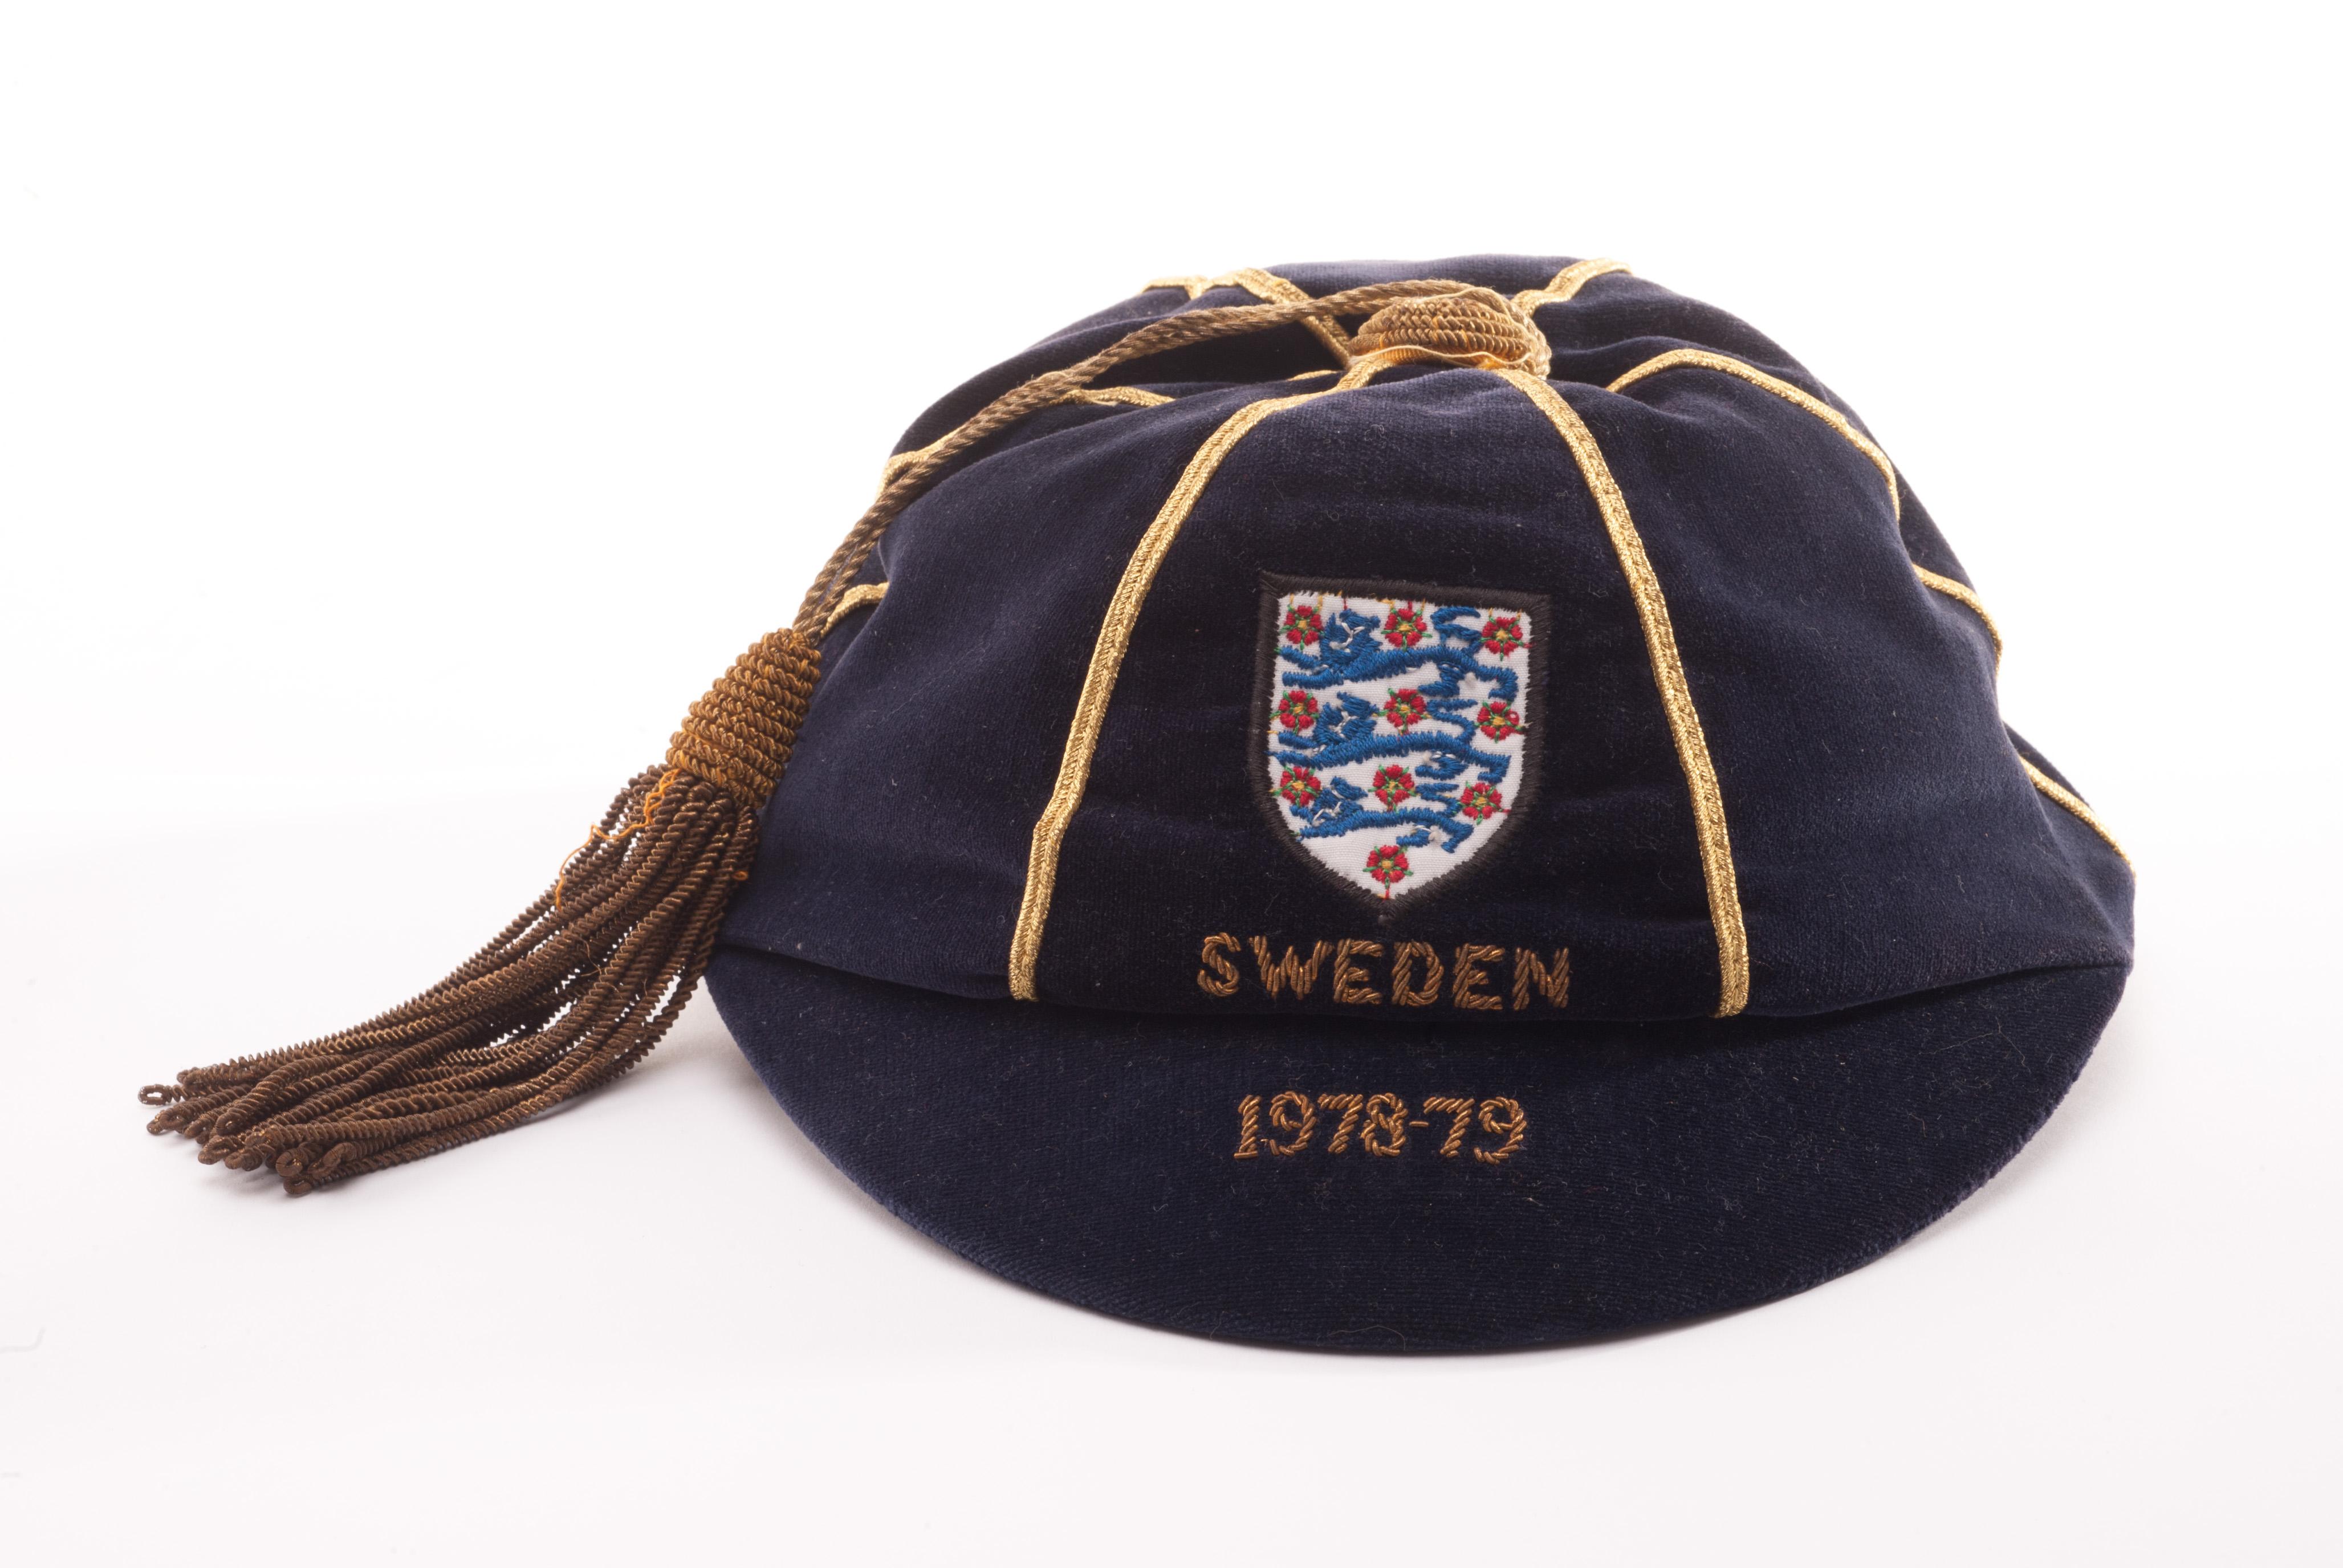 England Football Caps For Sale d75940082f0